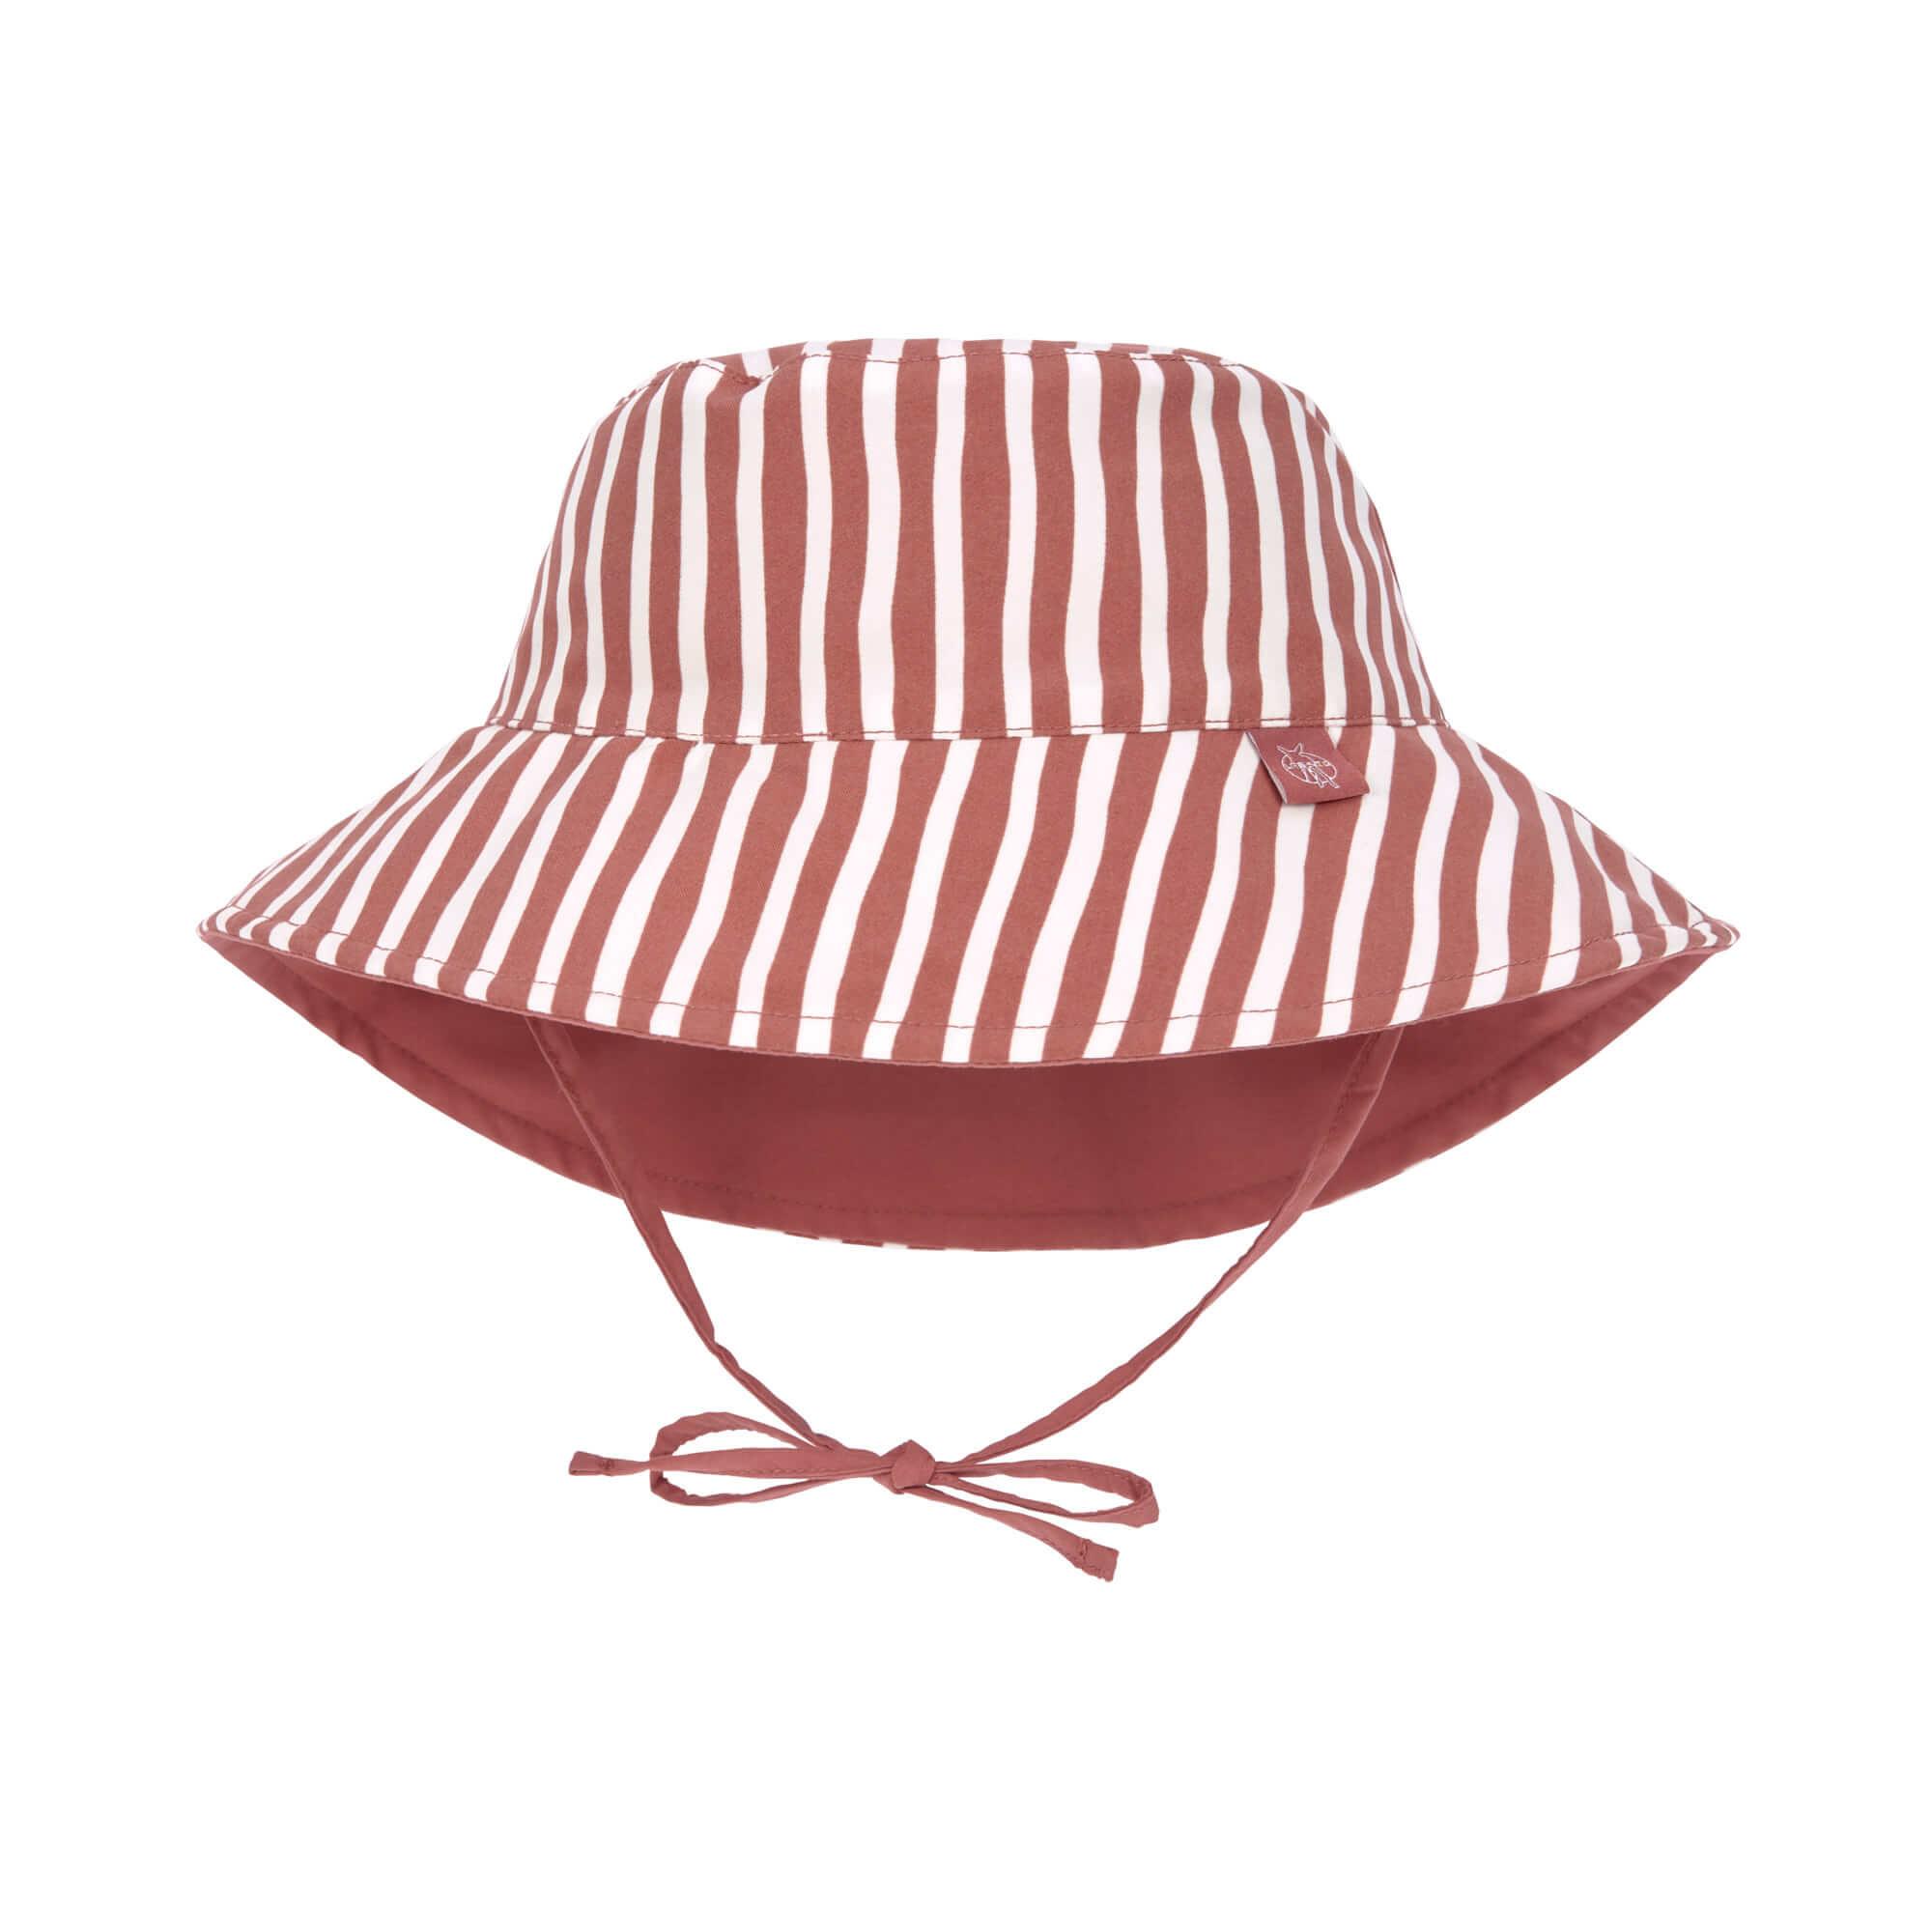 Lässig Splash & Fun Sun Protection Zonnehoed Vissershoed met UV bescherming - Stripes red 19-36 maan